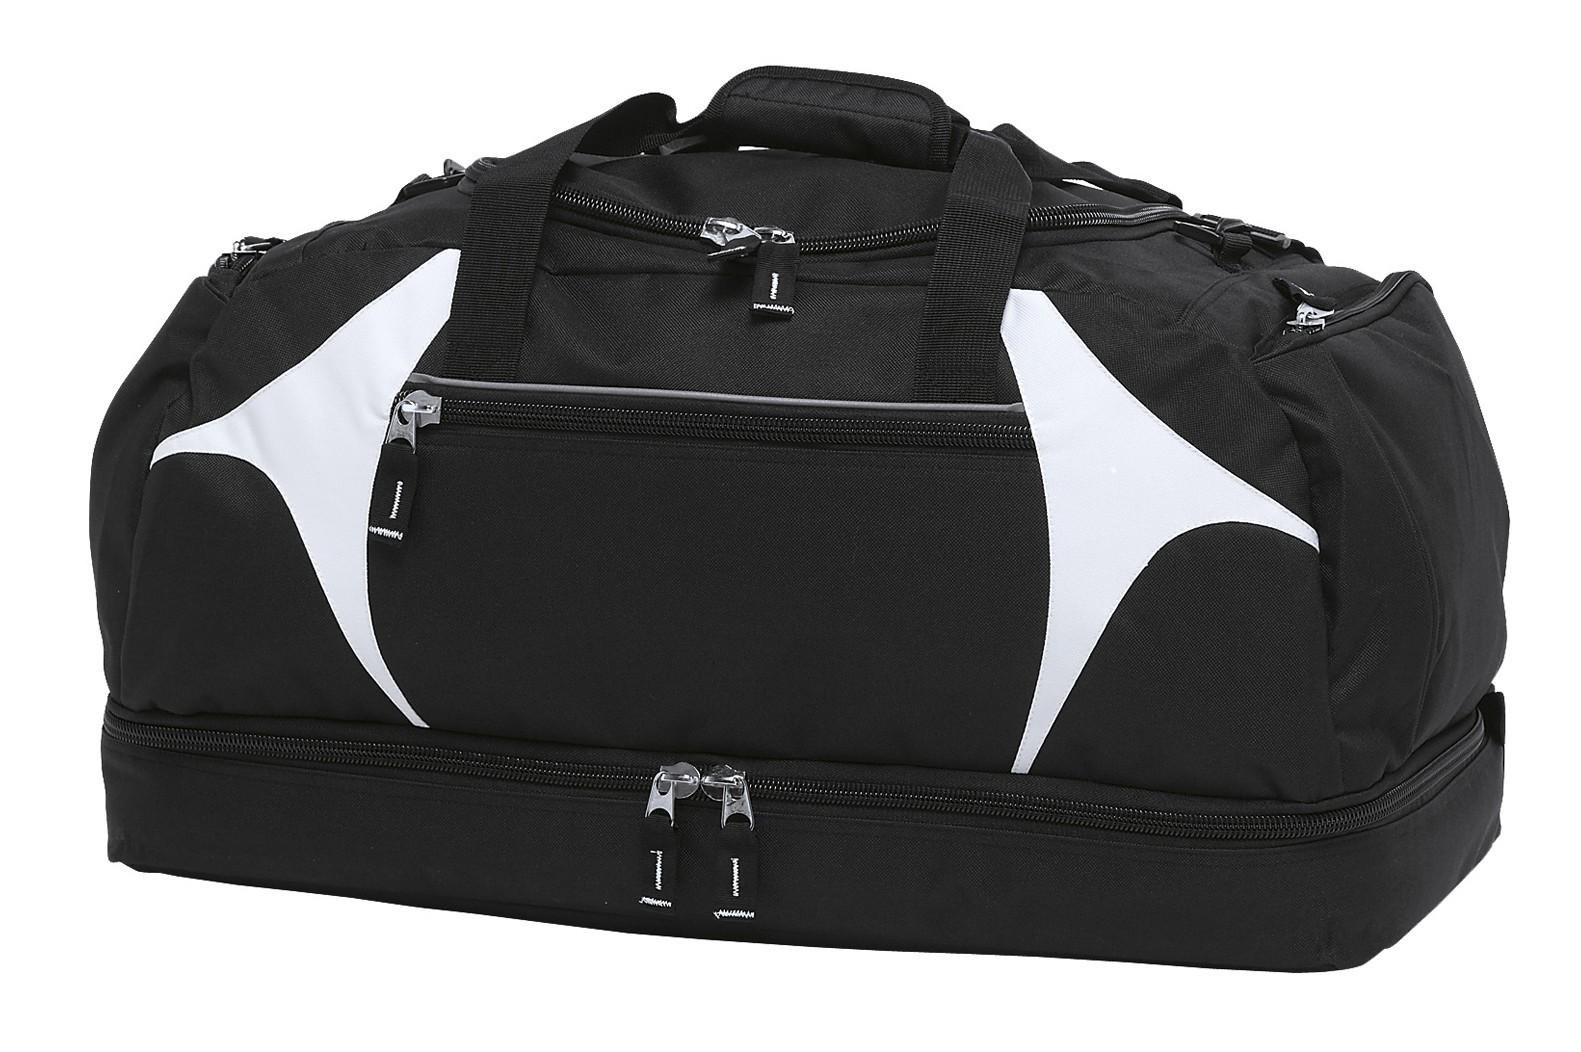 Spliced Zenith Sports Bag - Black & White